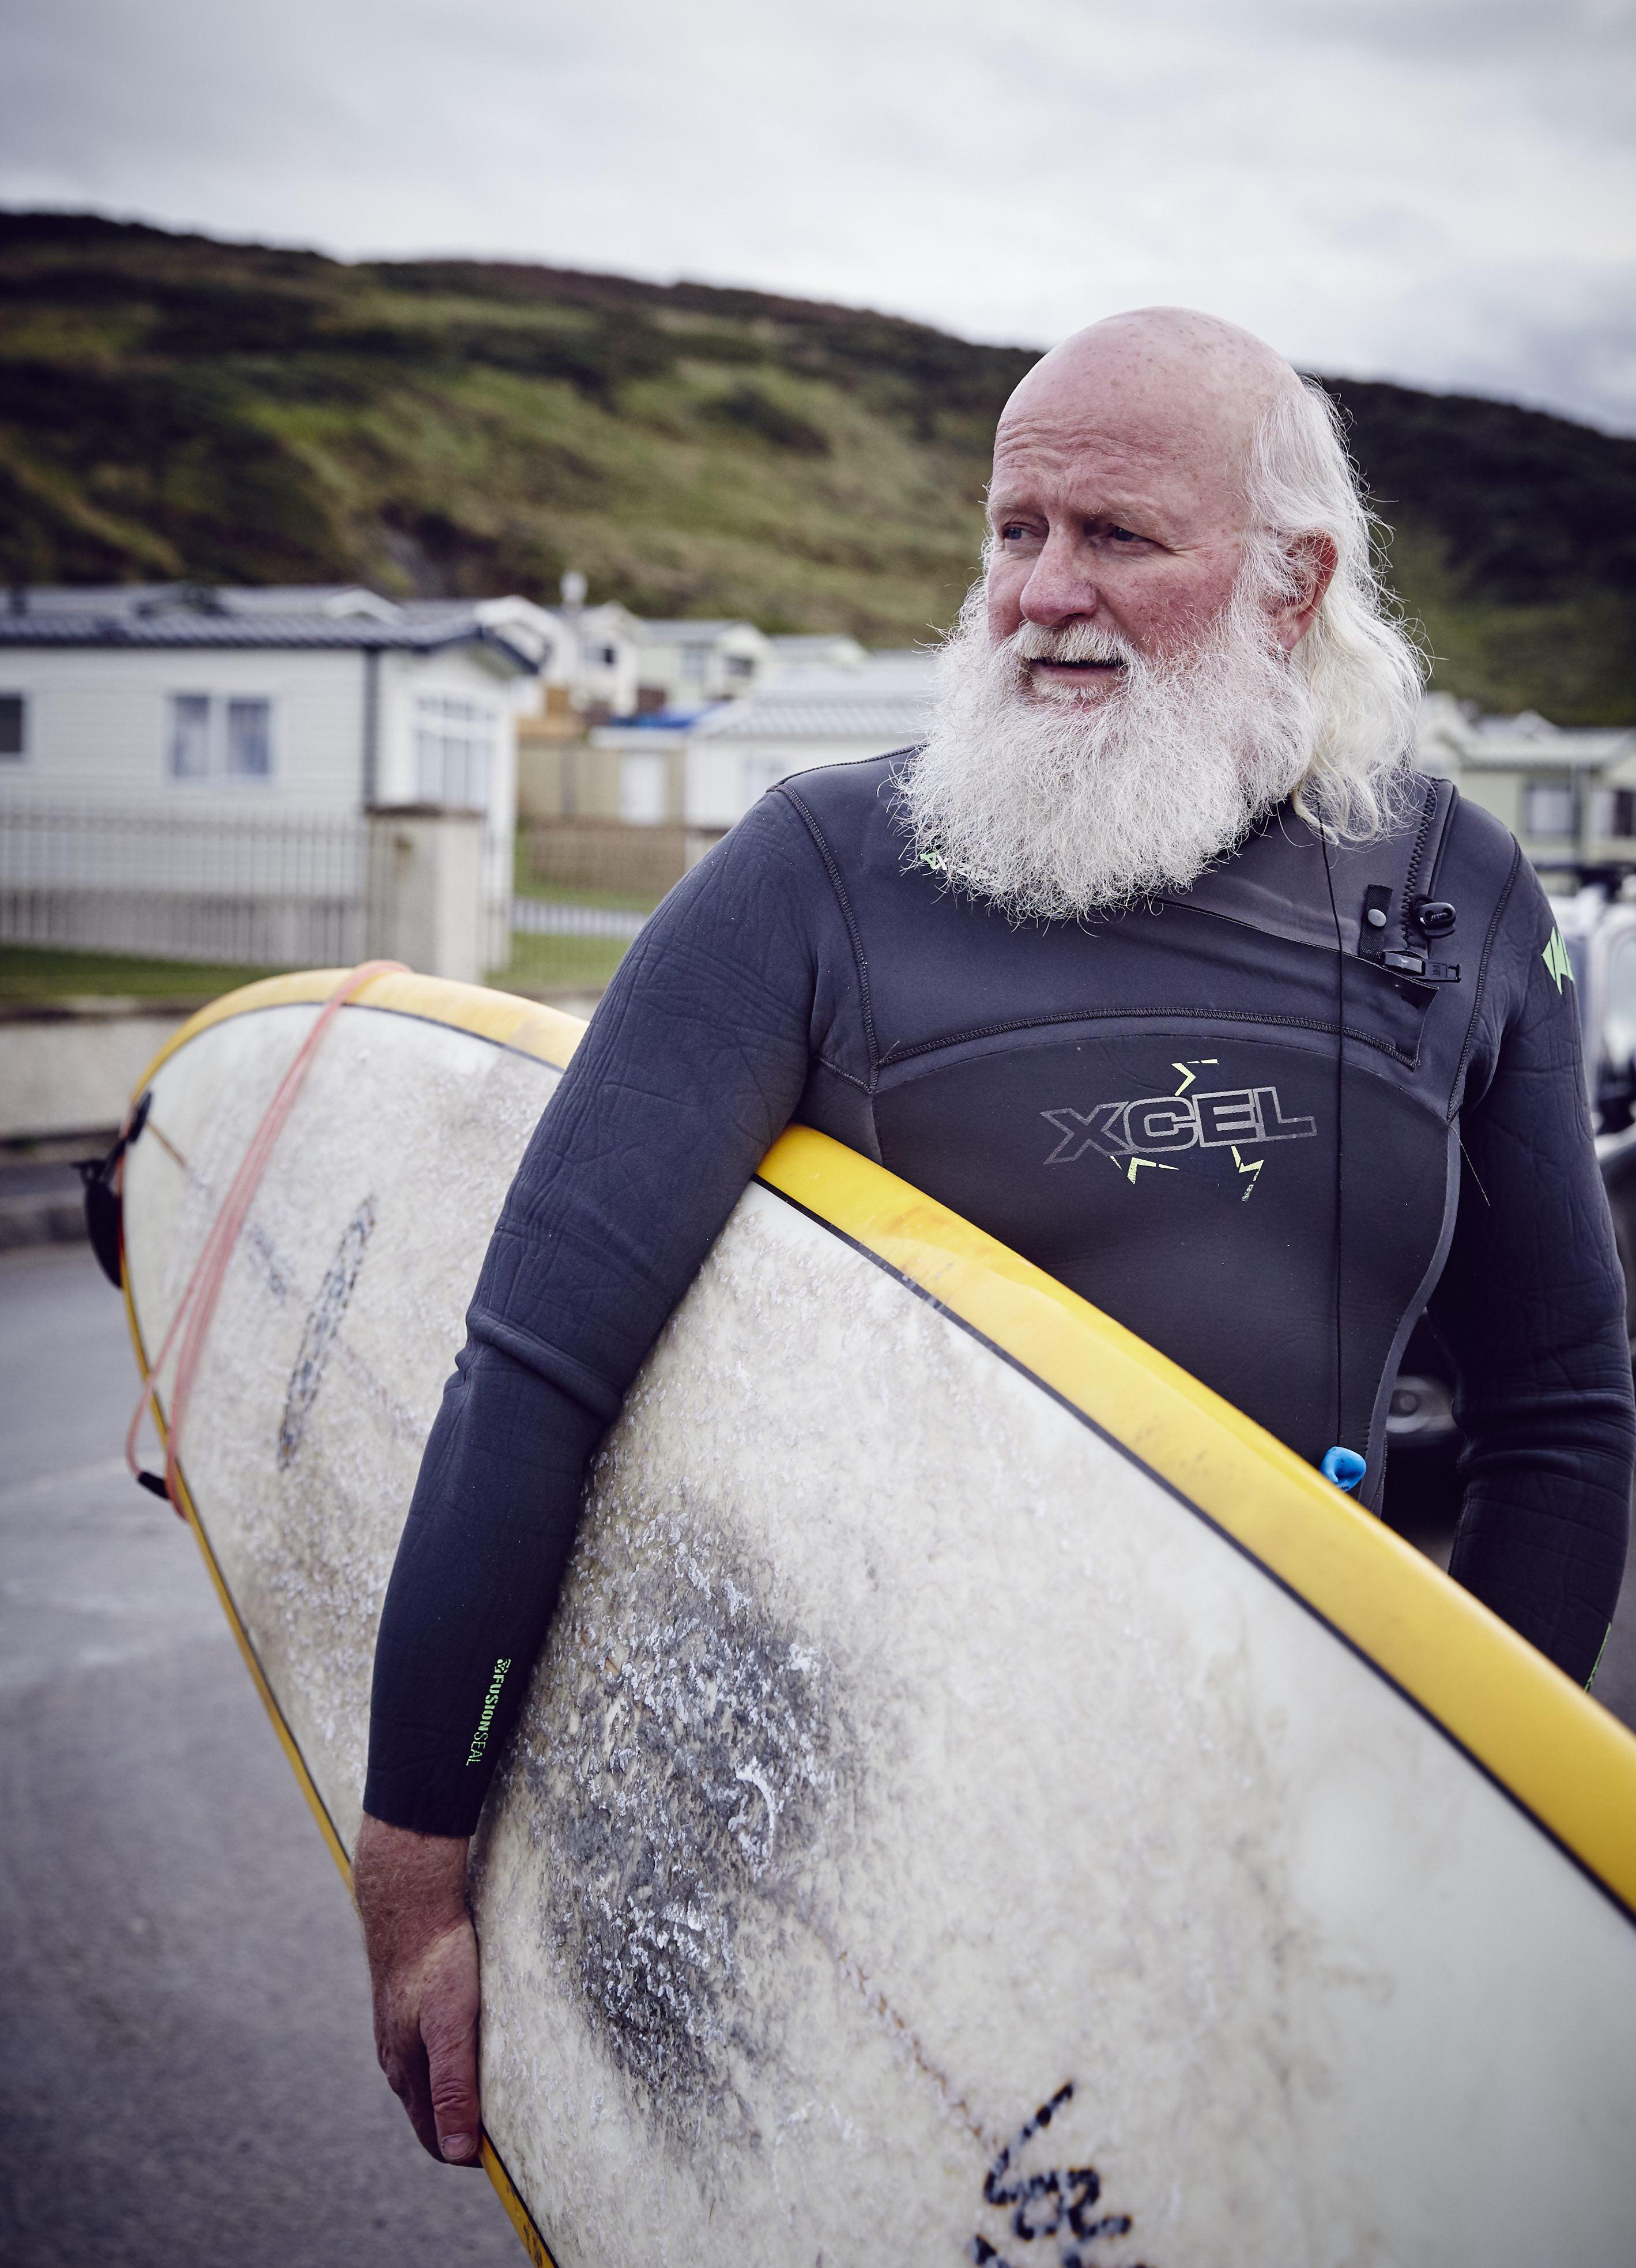 Irish_Surfing_2227